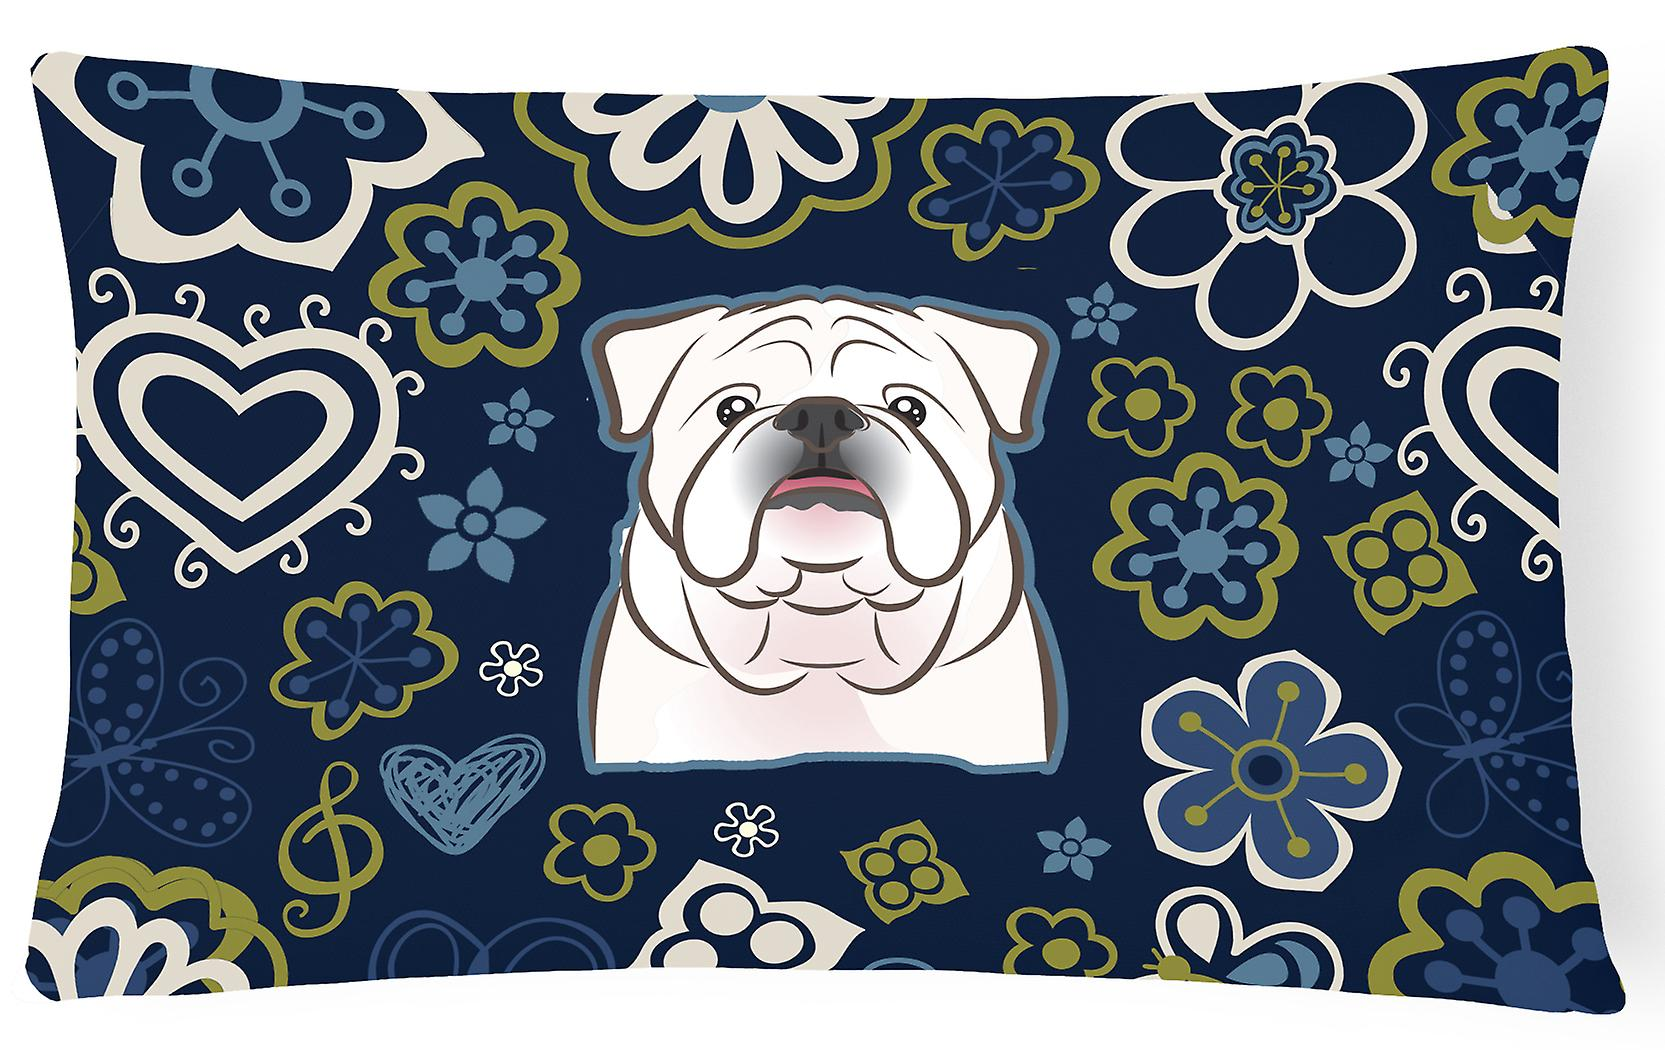 Bleus Oreiller Tissu Blanc Décoratif Fleurs Anglais Toile Bulldog hrCtsxQd